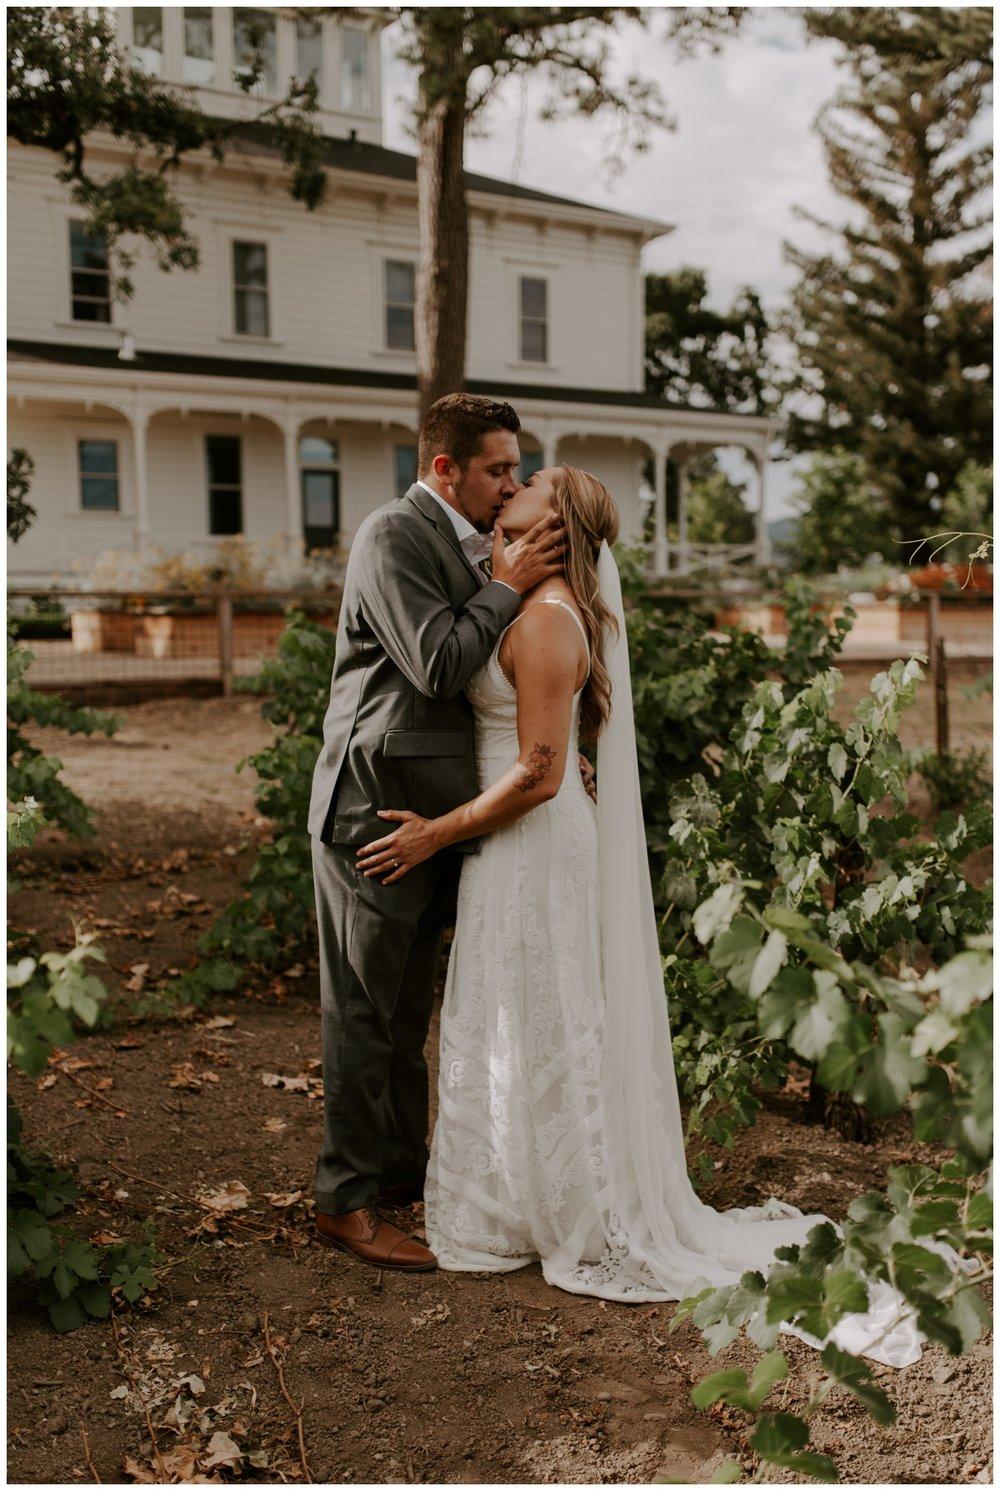 Napa Valley Backyard Wedding and Reception at Elizabeth Spencer Winery | Jessica Heron Images 121.jpg